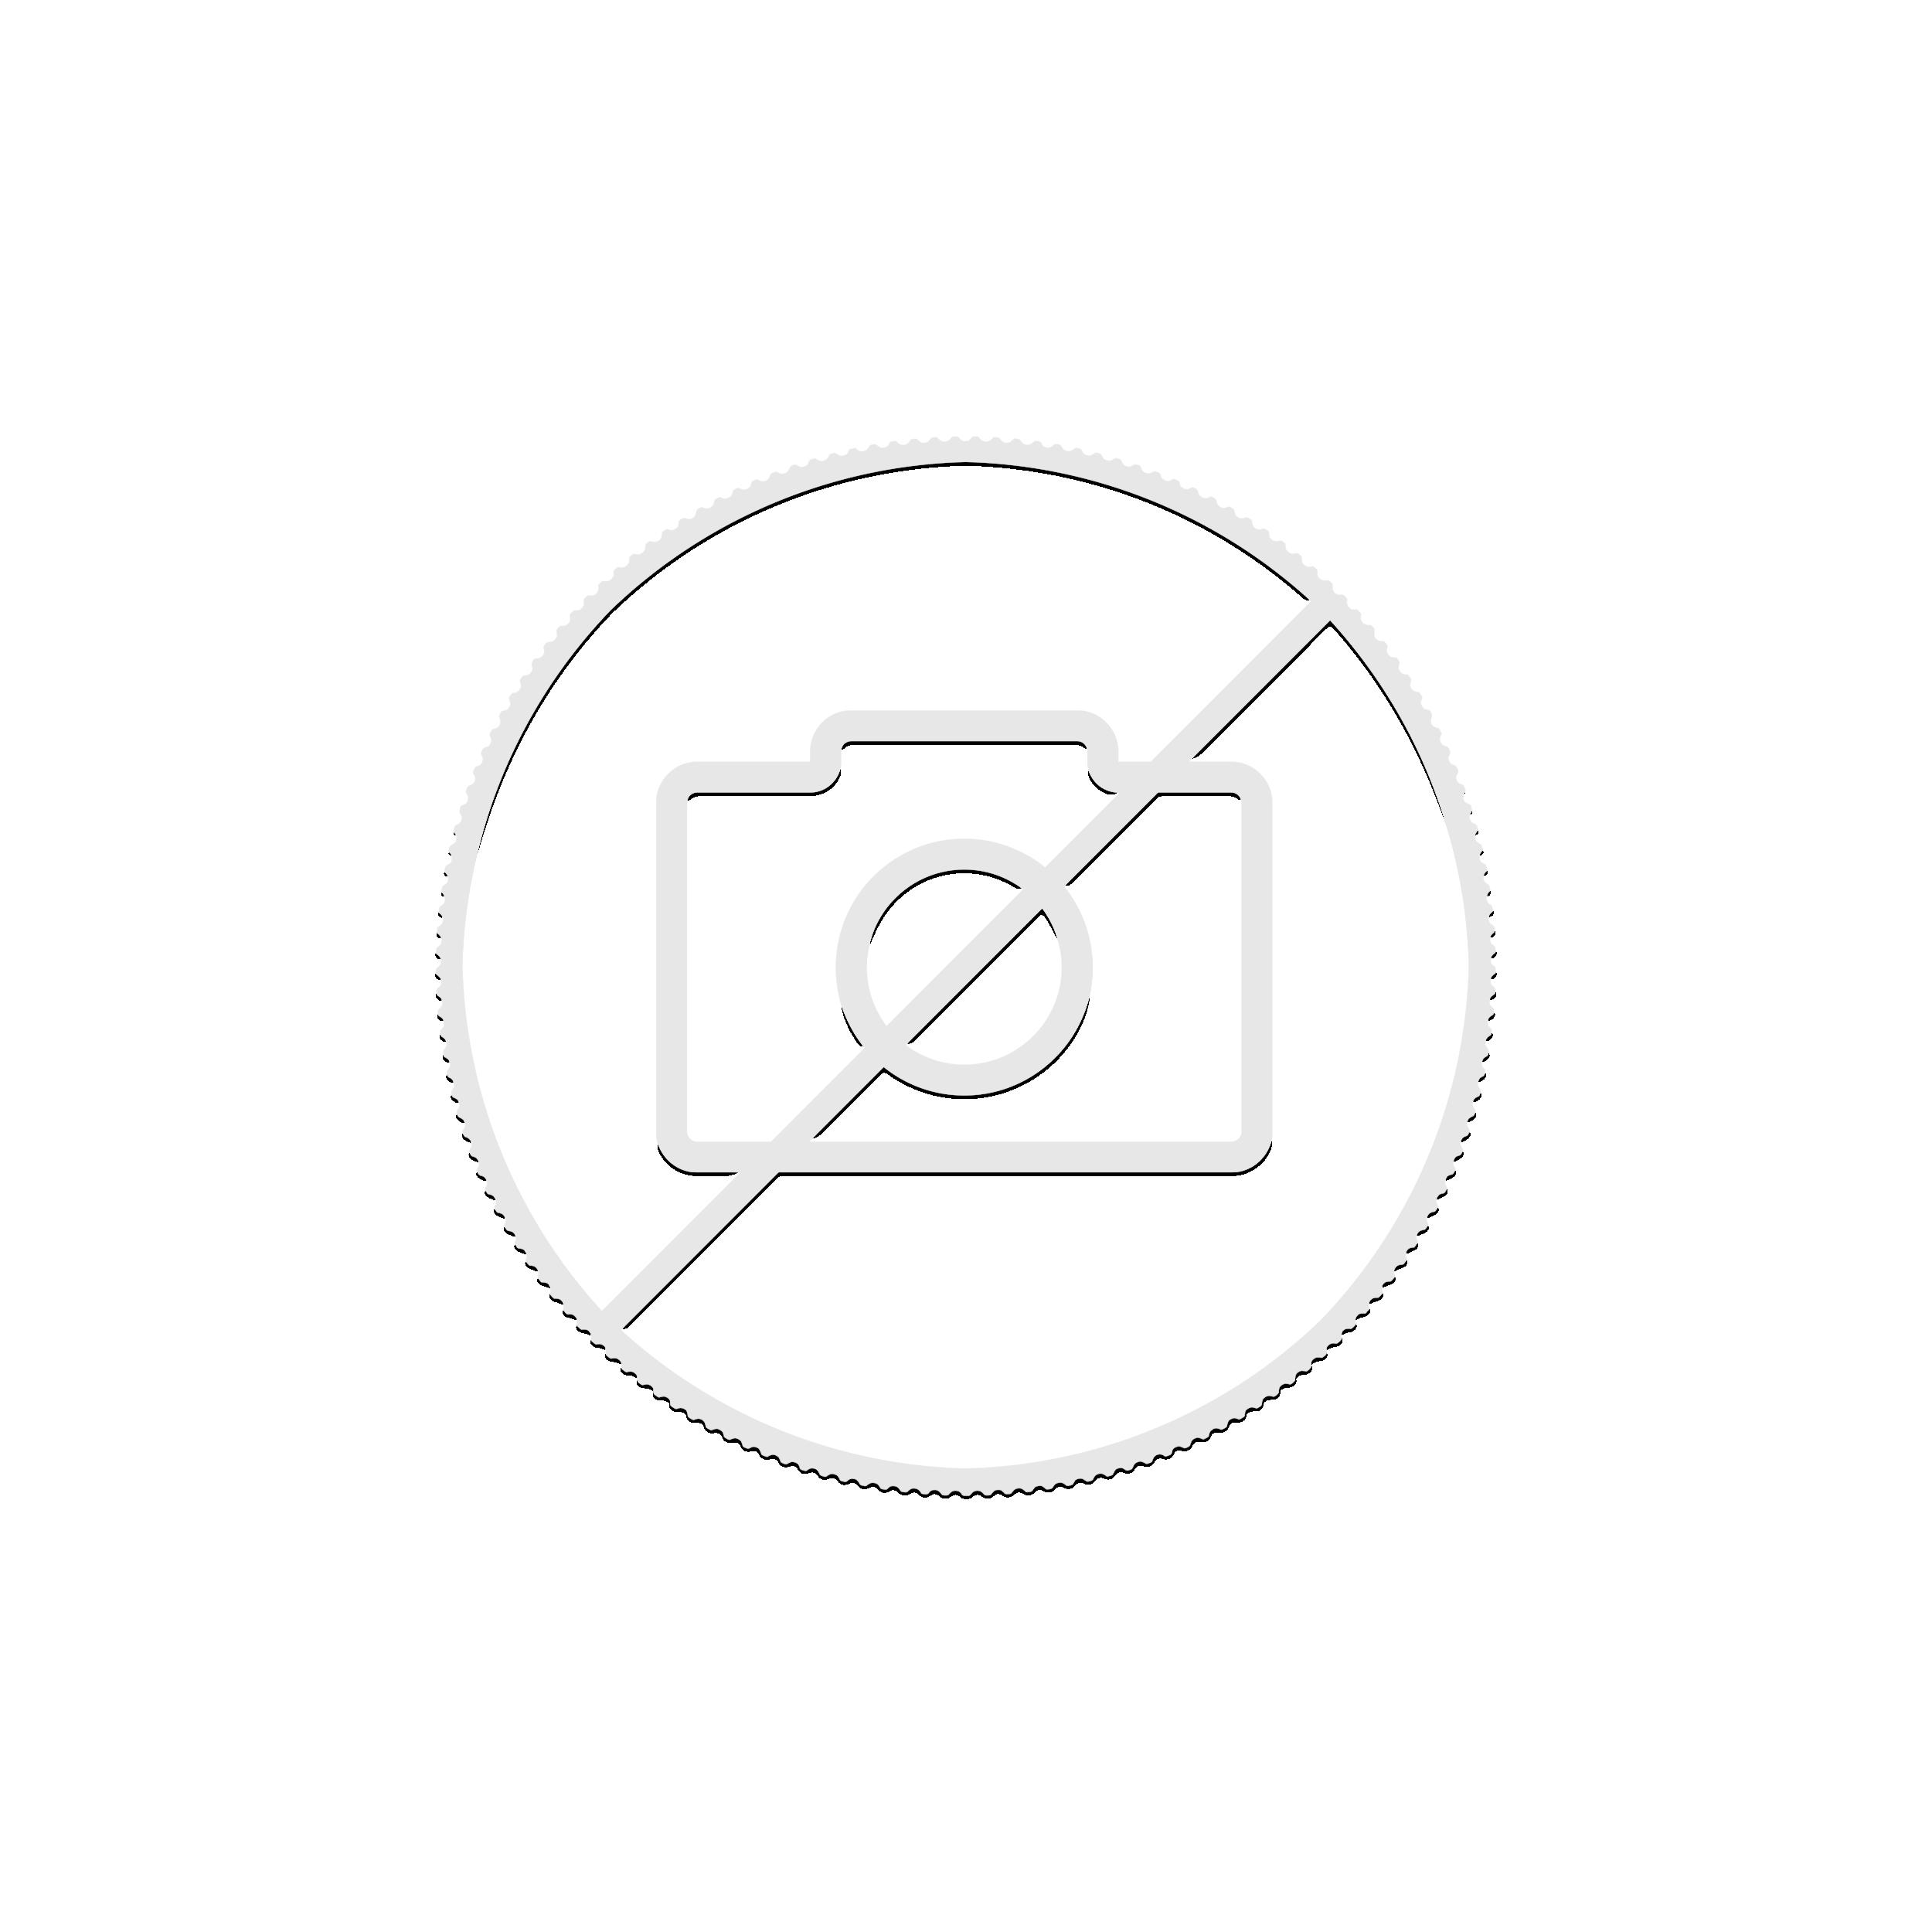 1 Gram gold Panda coin 2018